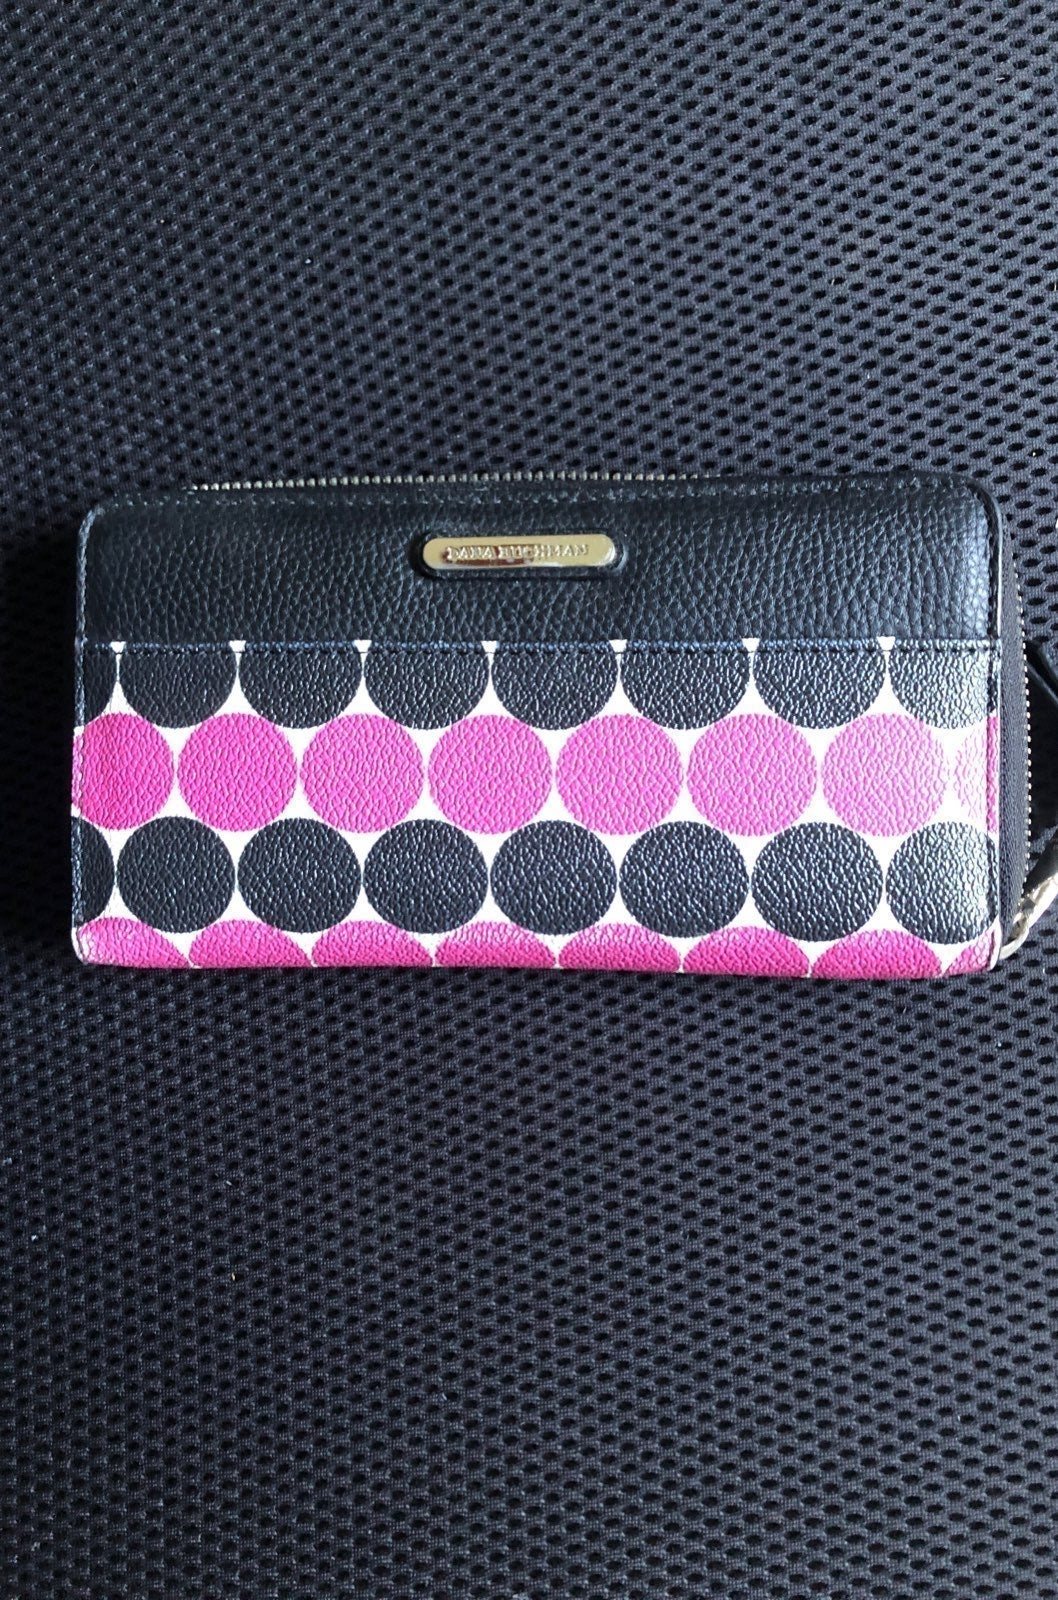 Dana Buchman black and pink clutch walle